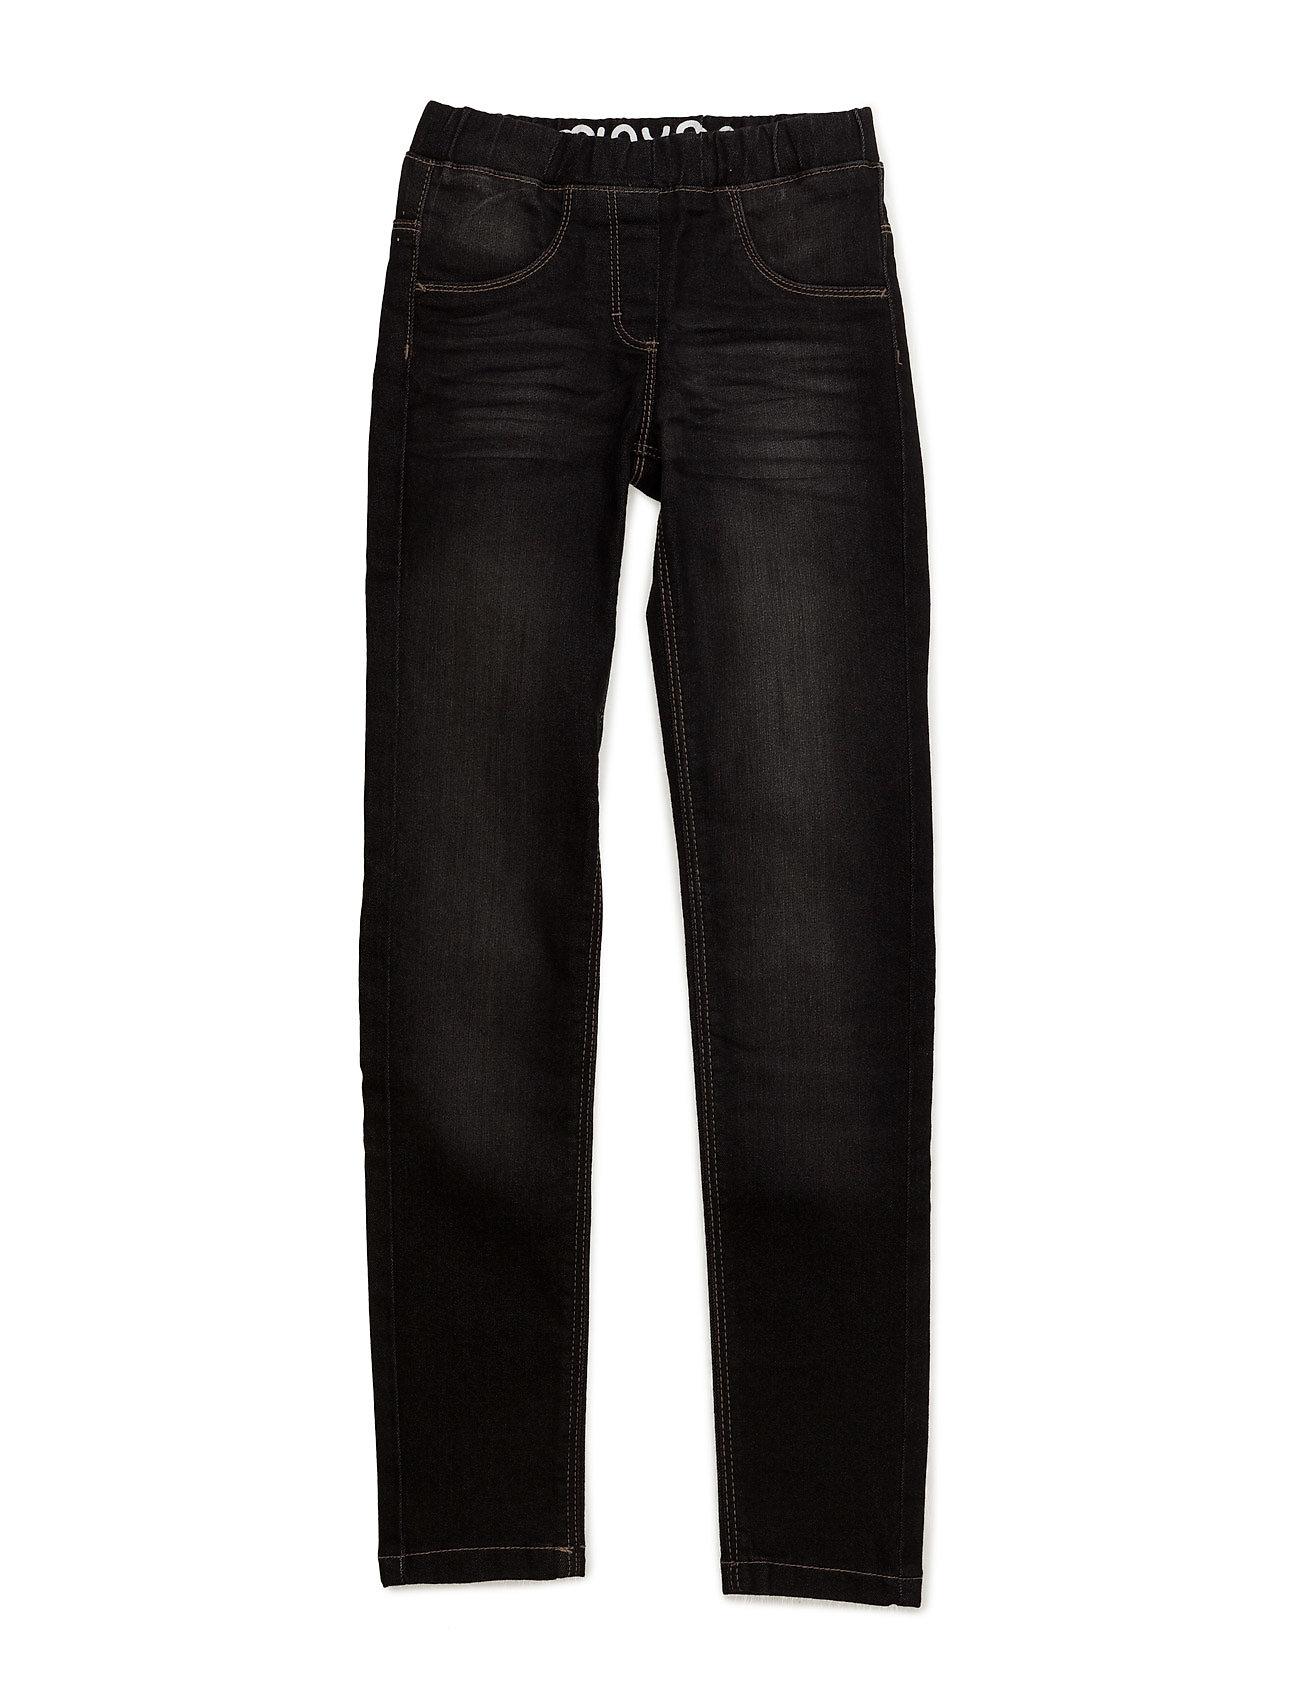 Minymo Jeans girl - Slim fit - BLACK